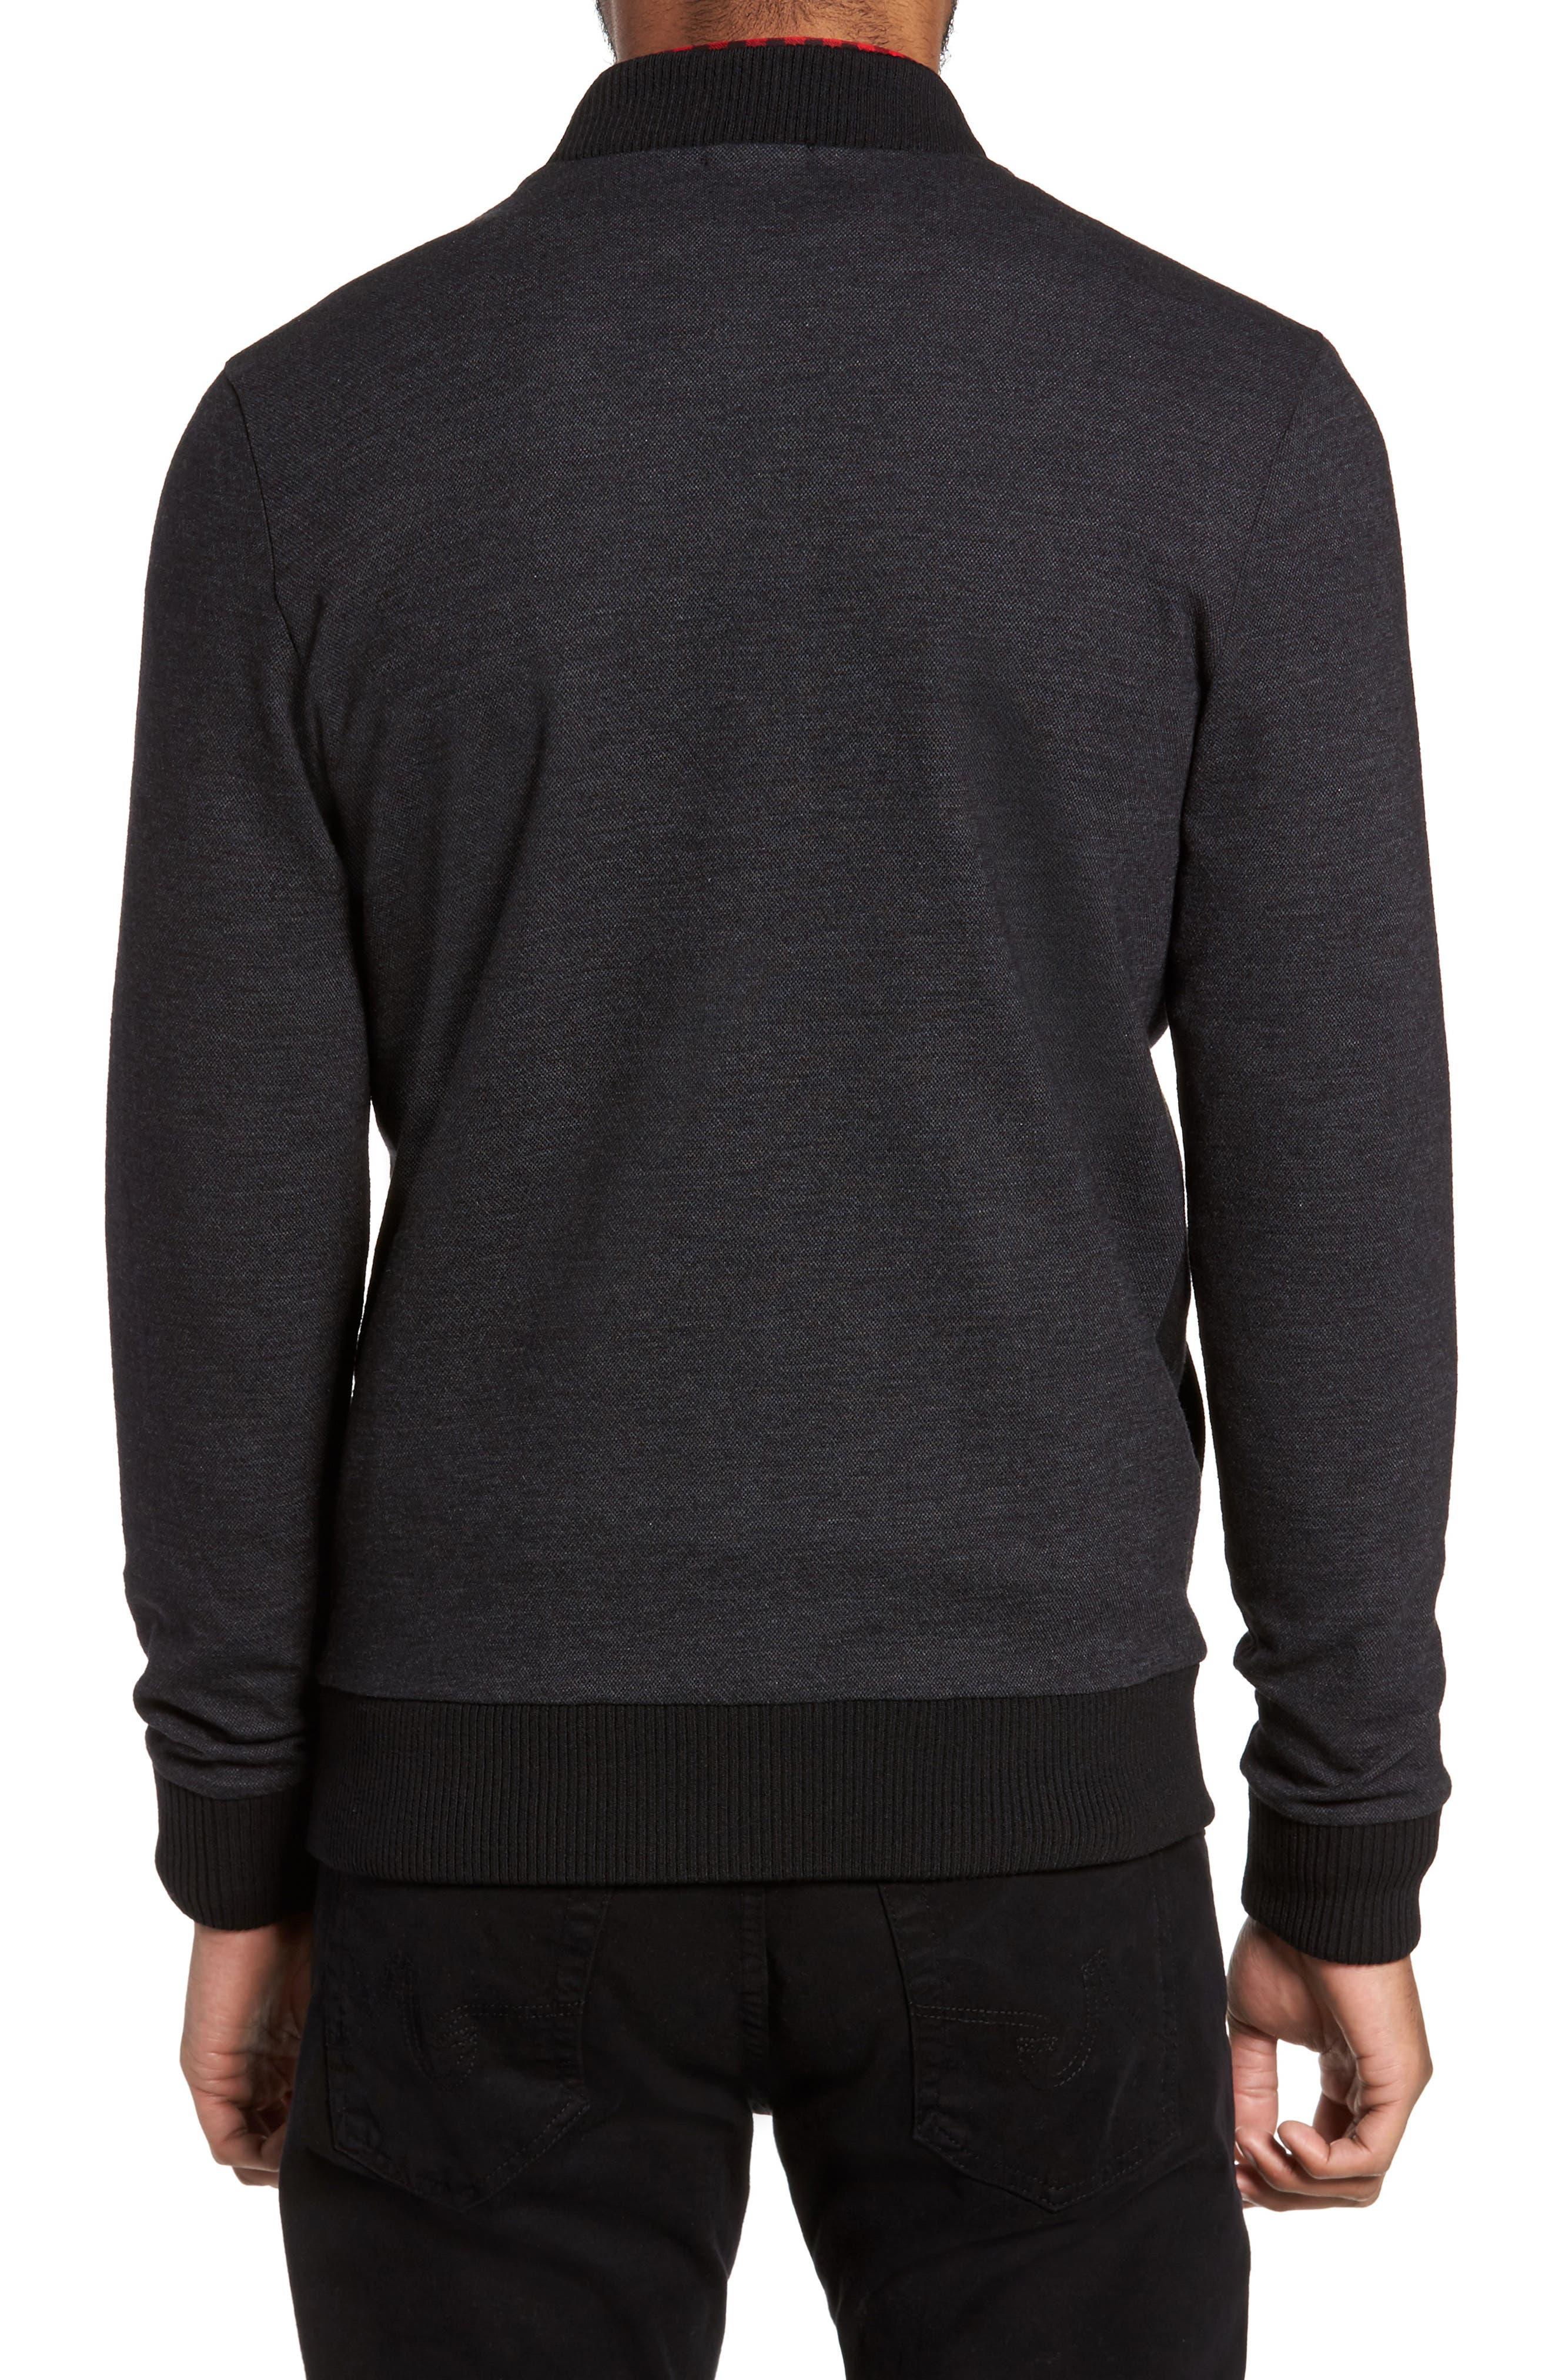 Salea Check Wool Blend Bomber Jacket,                             Alternate thumbnail 2, color,                             001